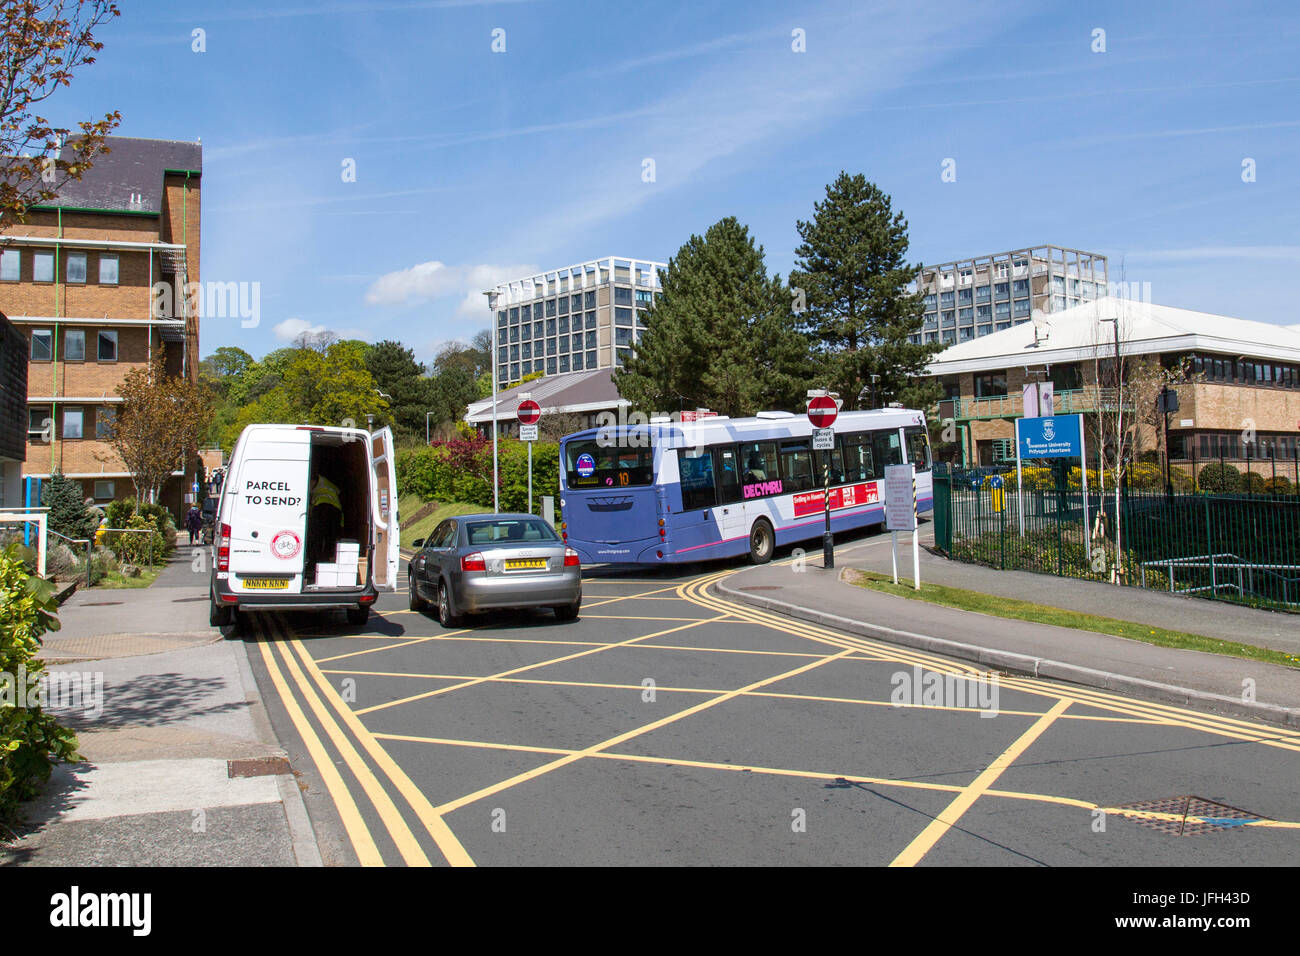 Traffic Congestion at Singleton Hospital - Stock Image